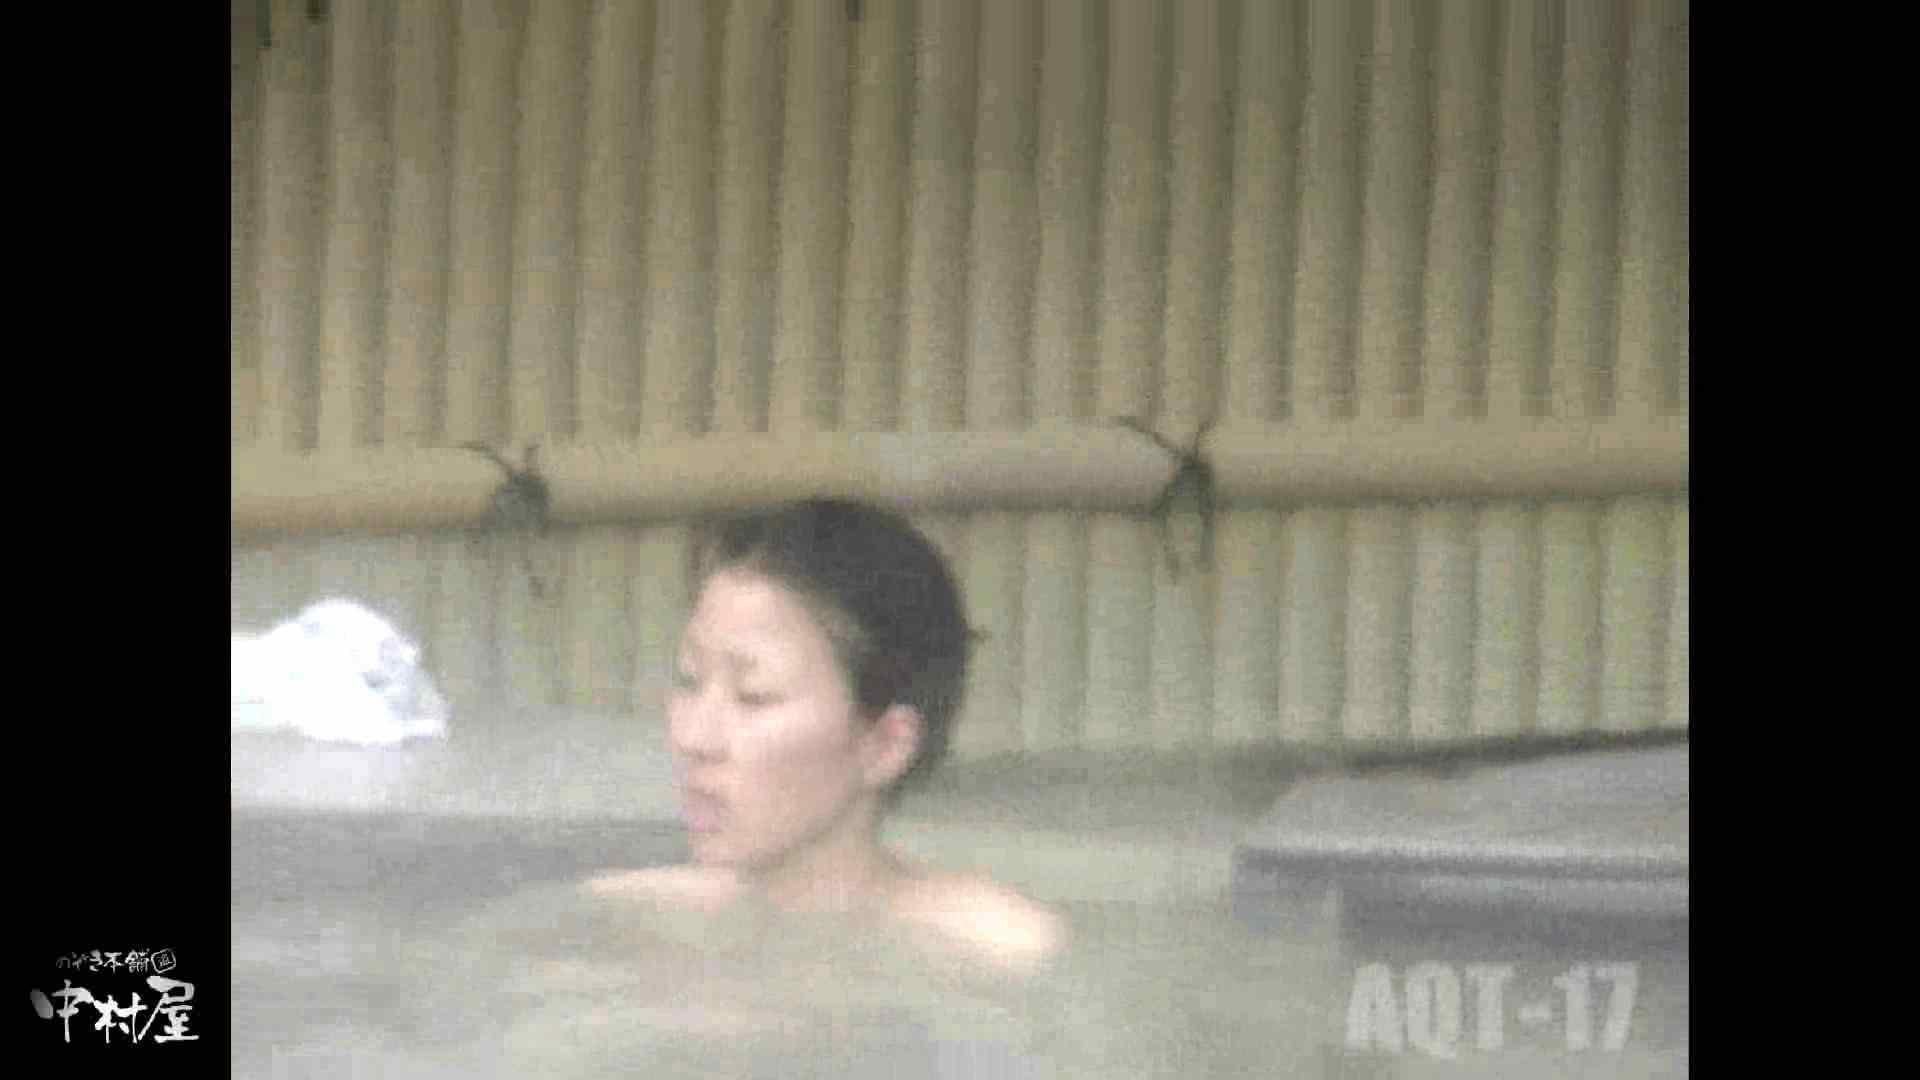 Aquaな露天風呂Vol.881潜入盗撮露天風呂十七判湯 其の二 露天   HなOL  101pic 1